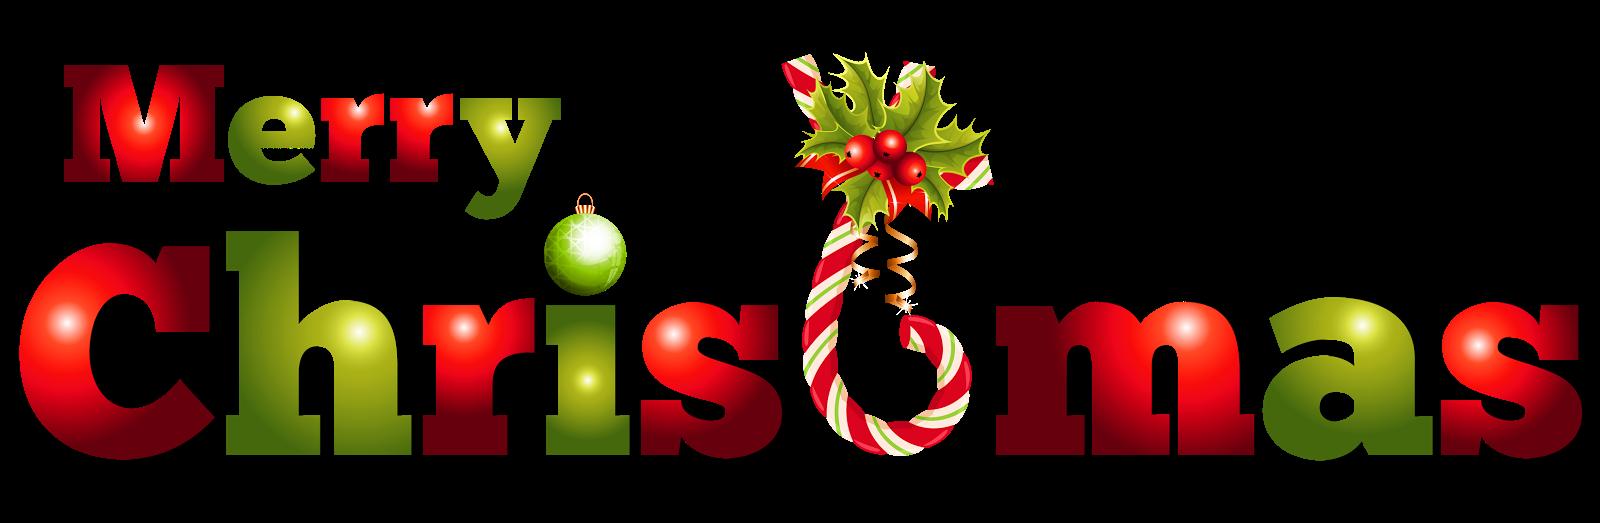 Merry christmas clip art .-Merry christmas clip art .-15